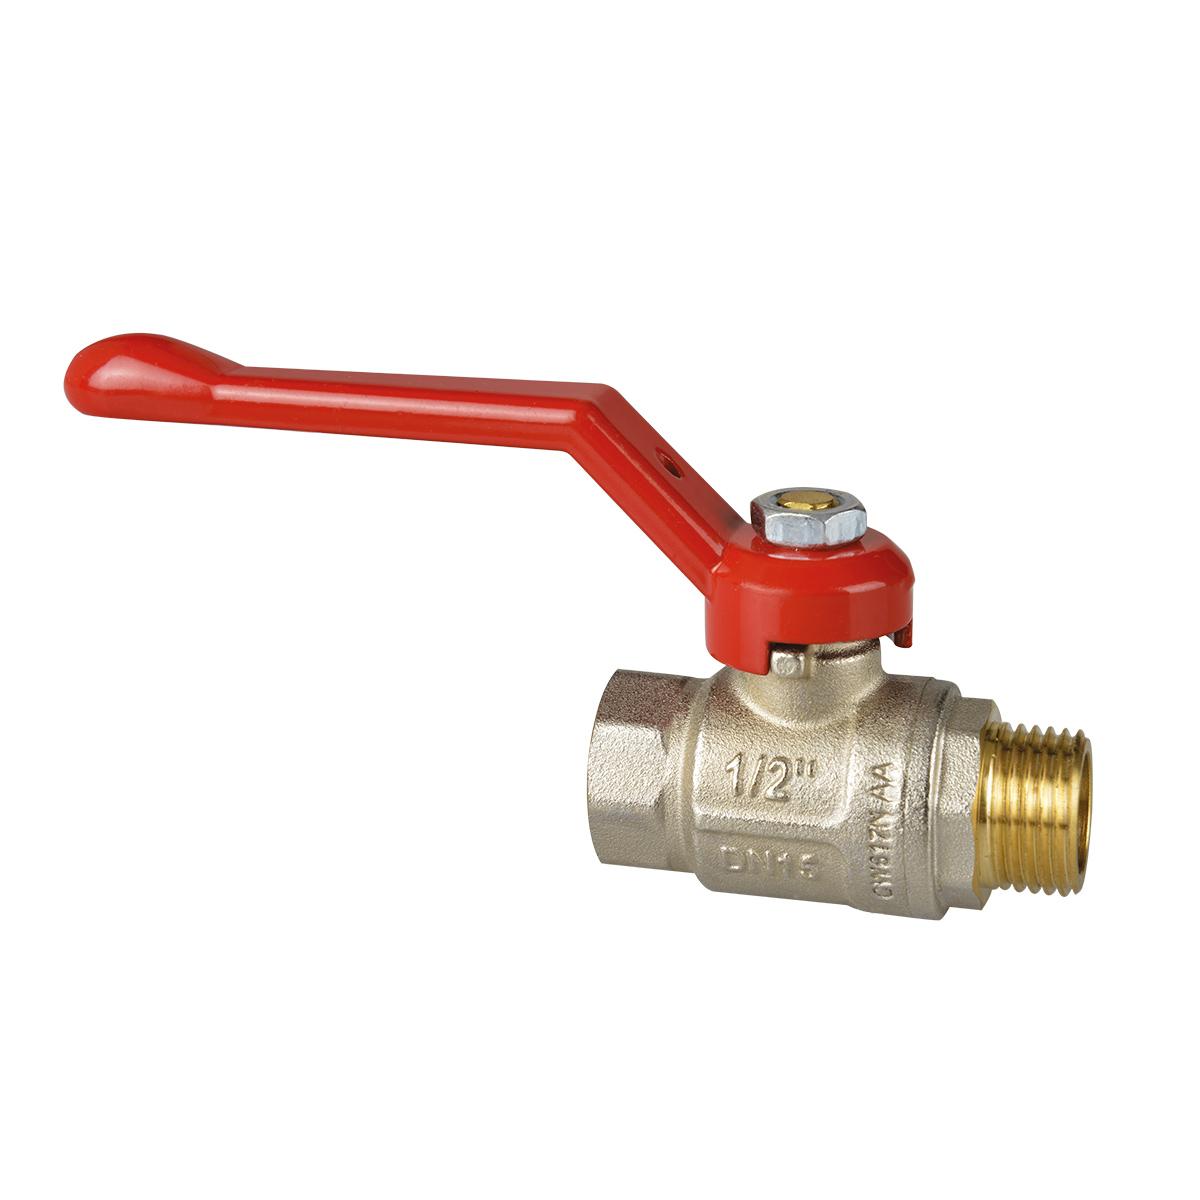 Full bore ball valve double O-ring anti-blow stem.